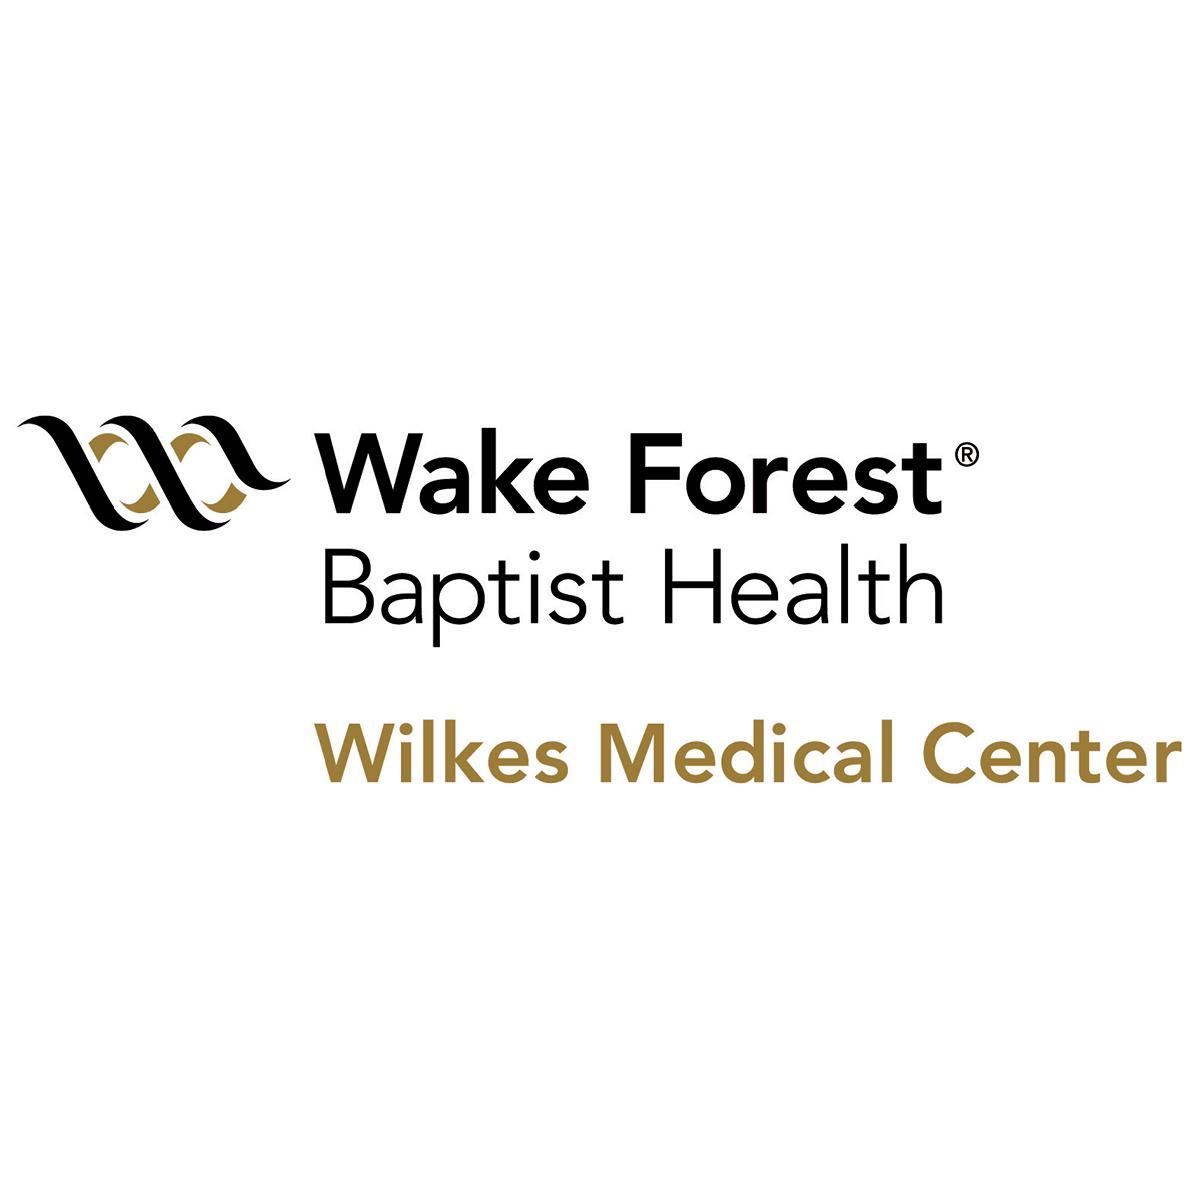 WFBH-Wilkes Medical Logo